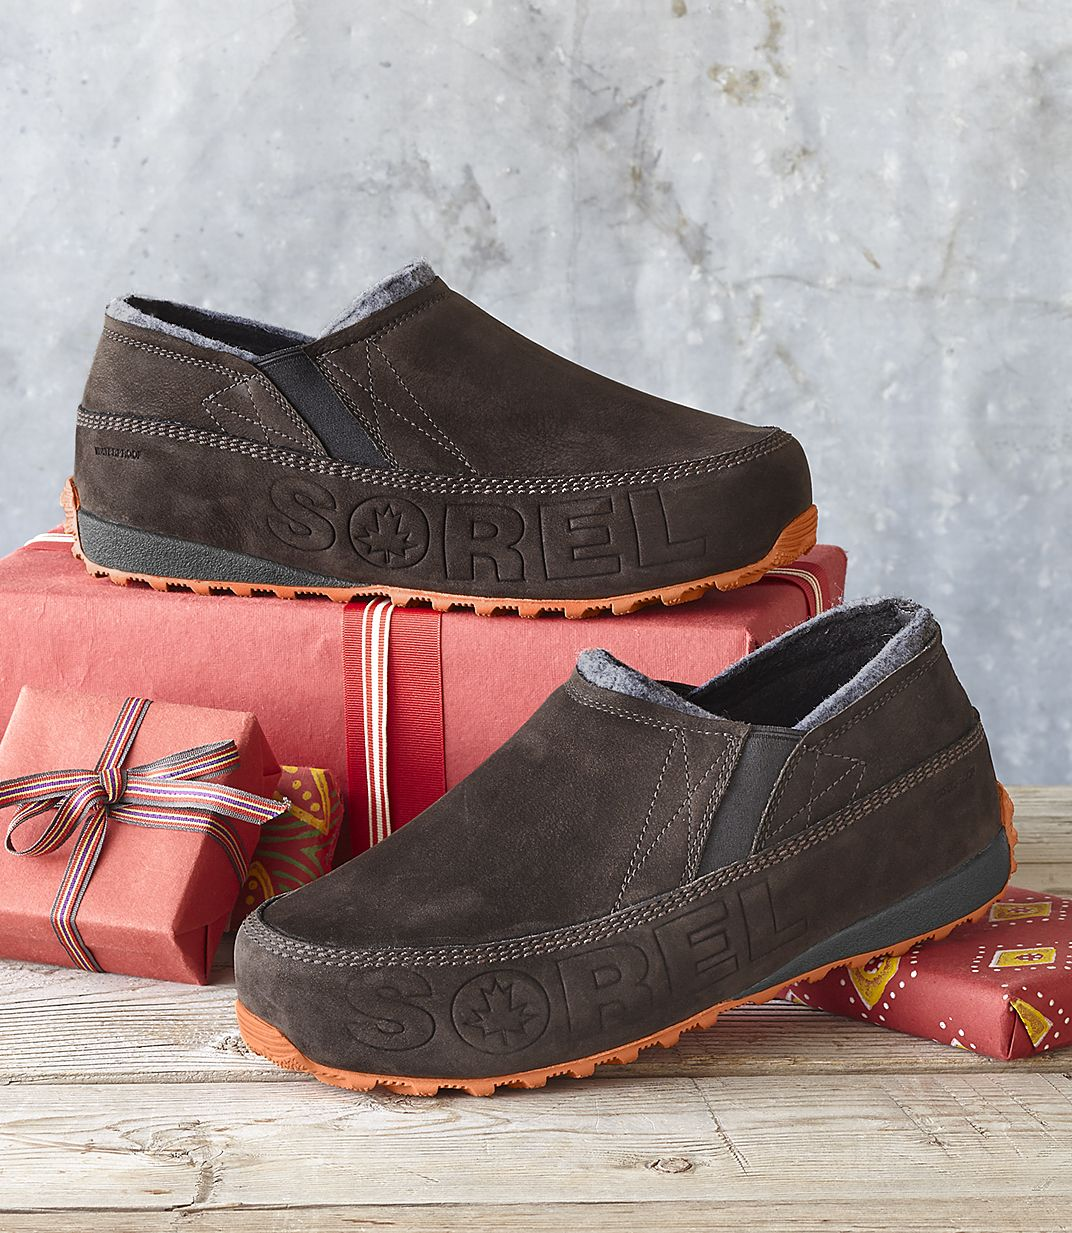 Men's Sorel All-Weather Sneaker